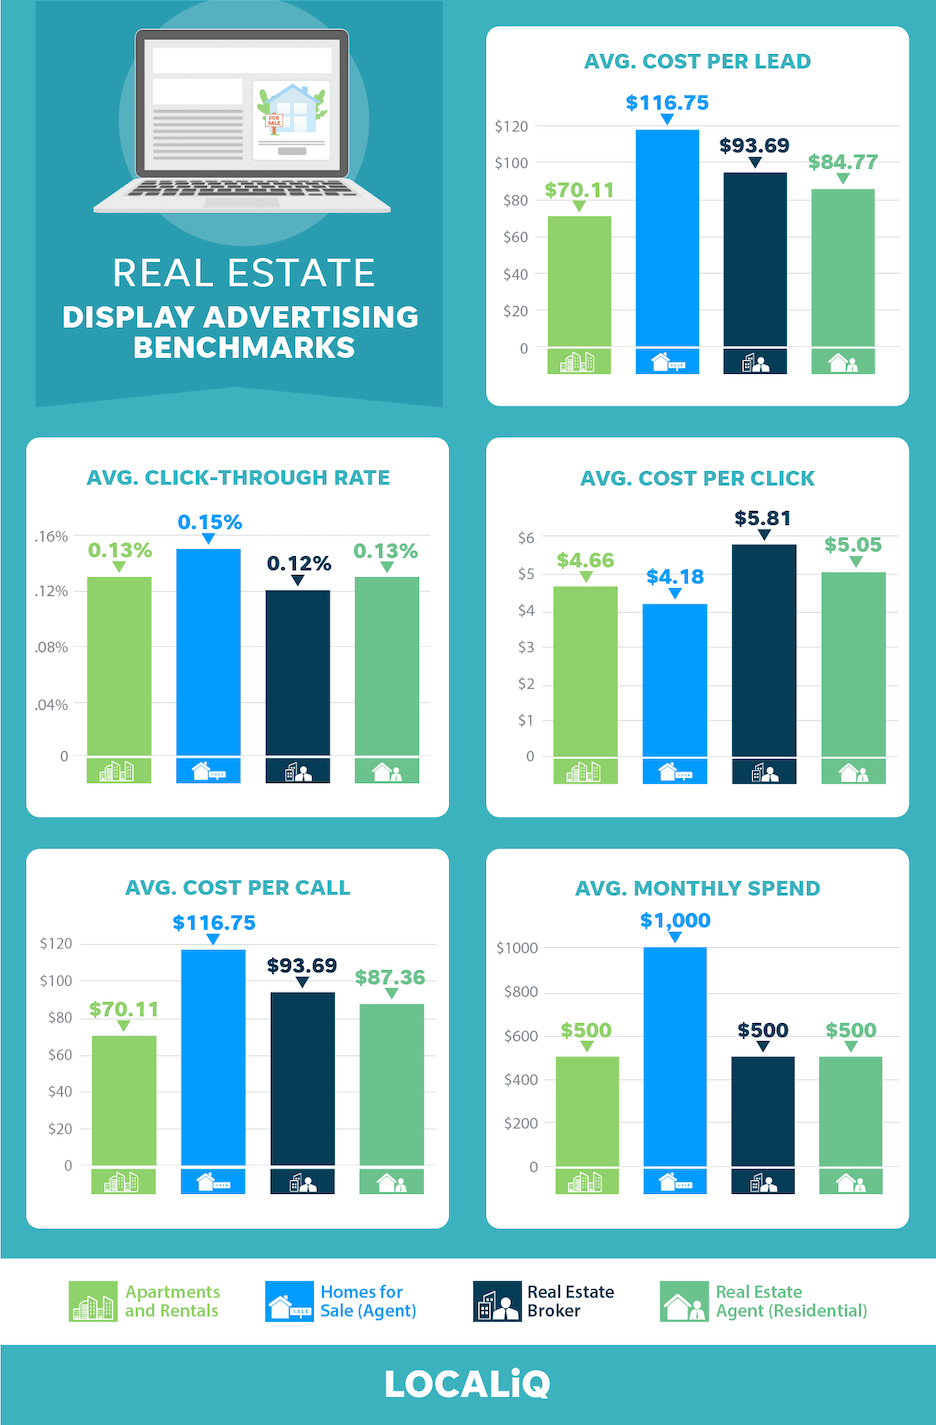 Real estate advertising benchmarks for display advertising